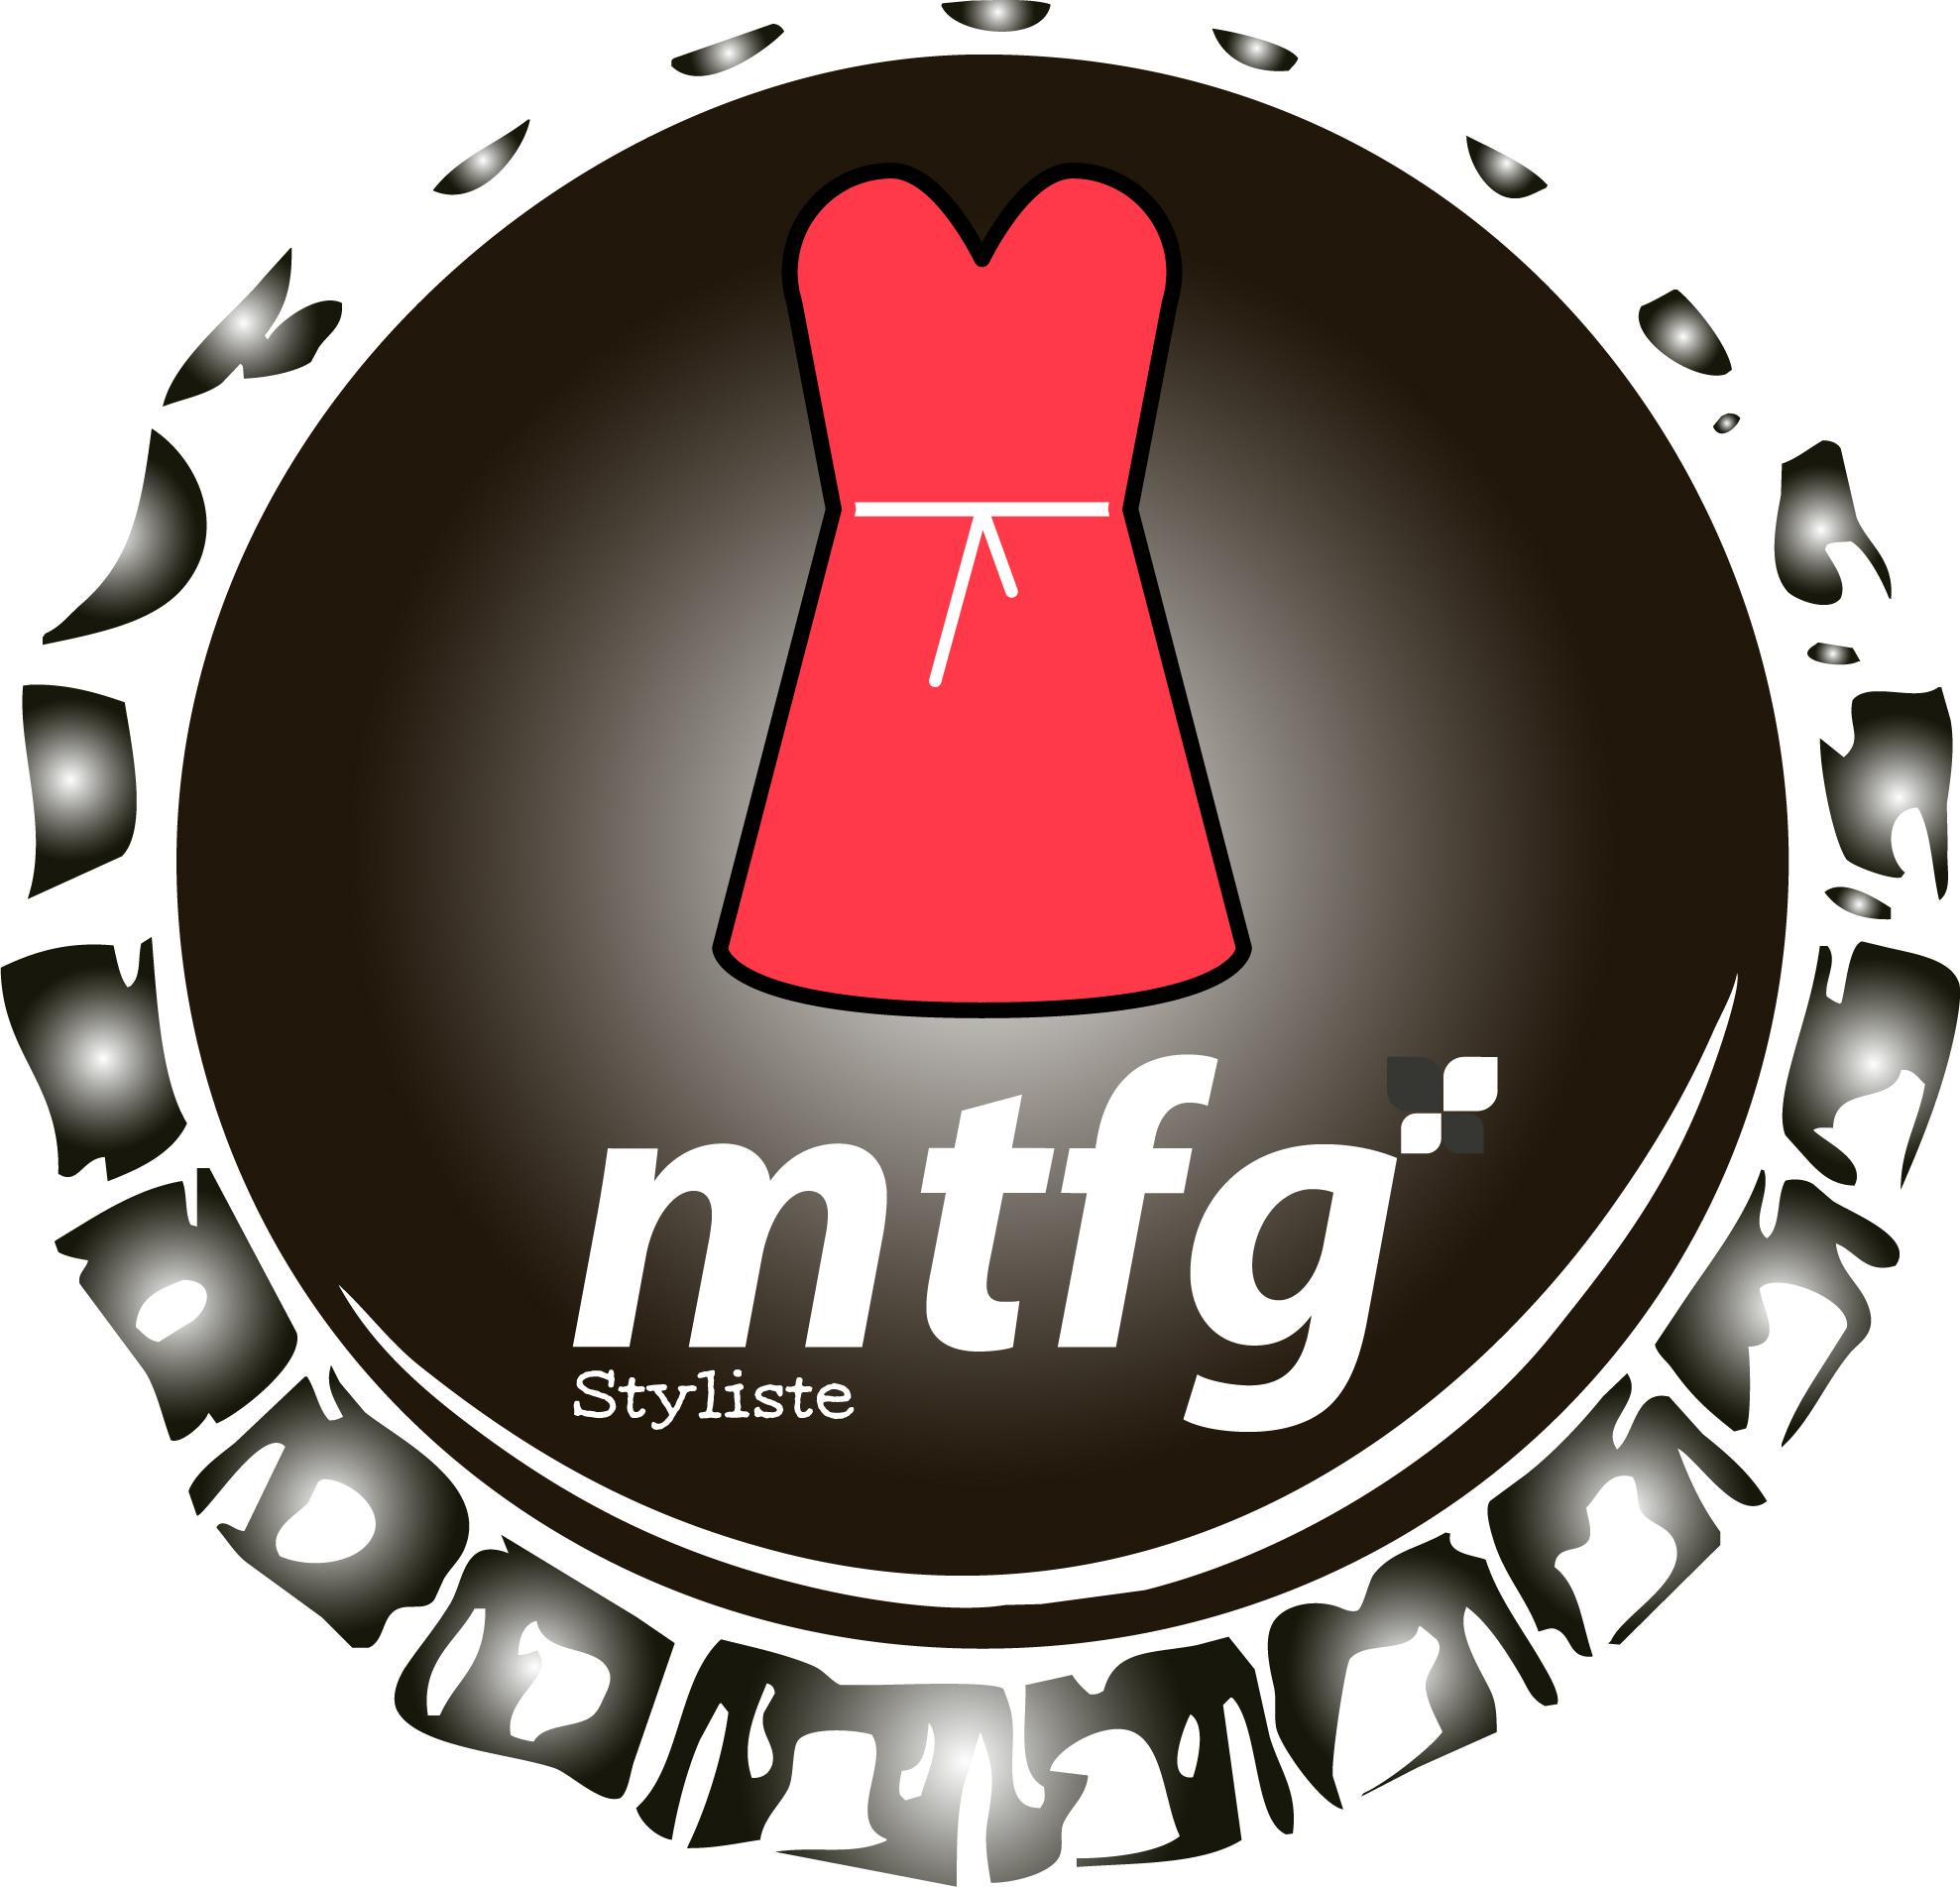 MTFG Styliste